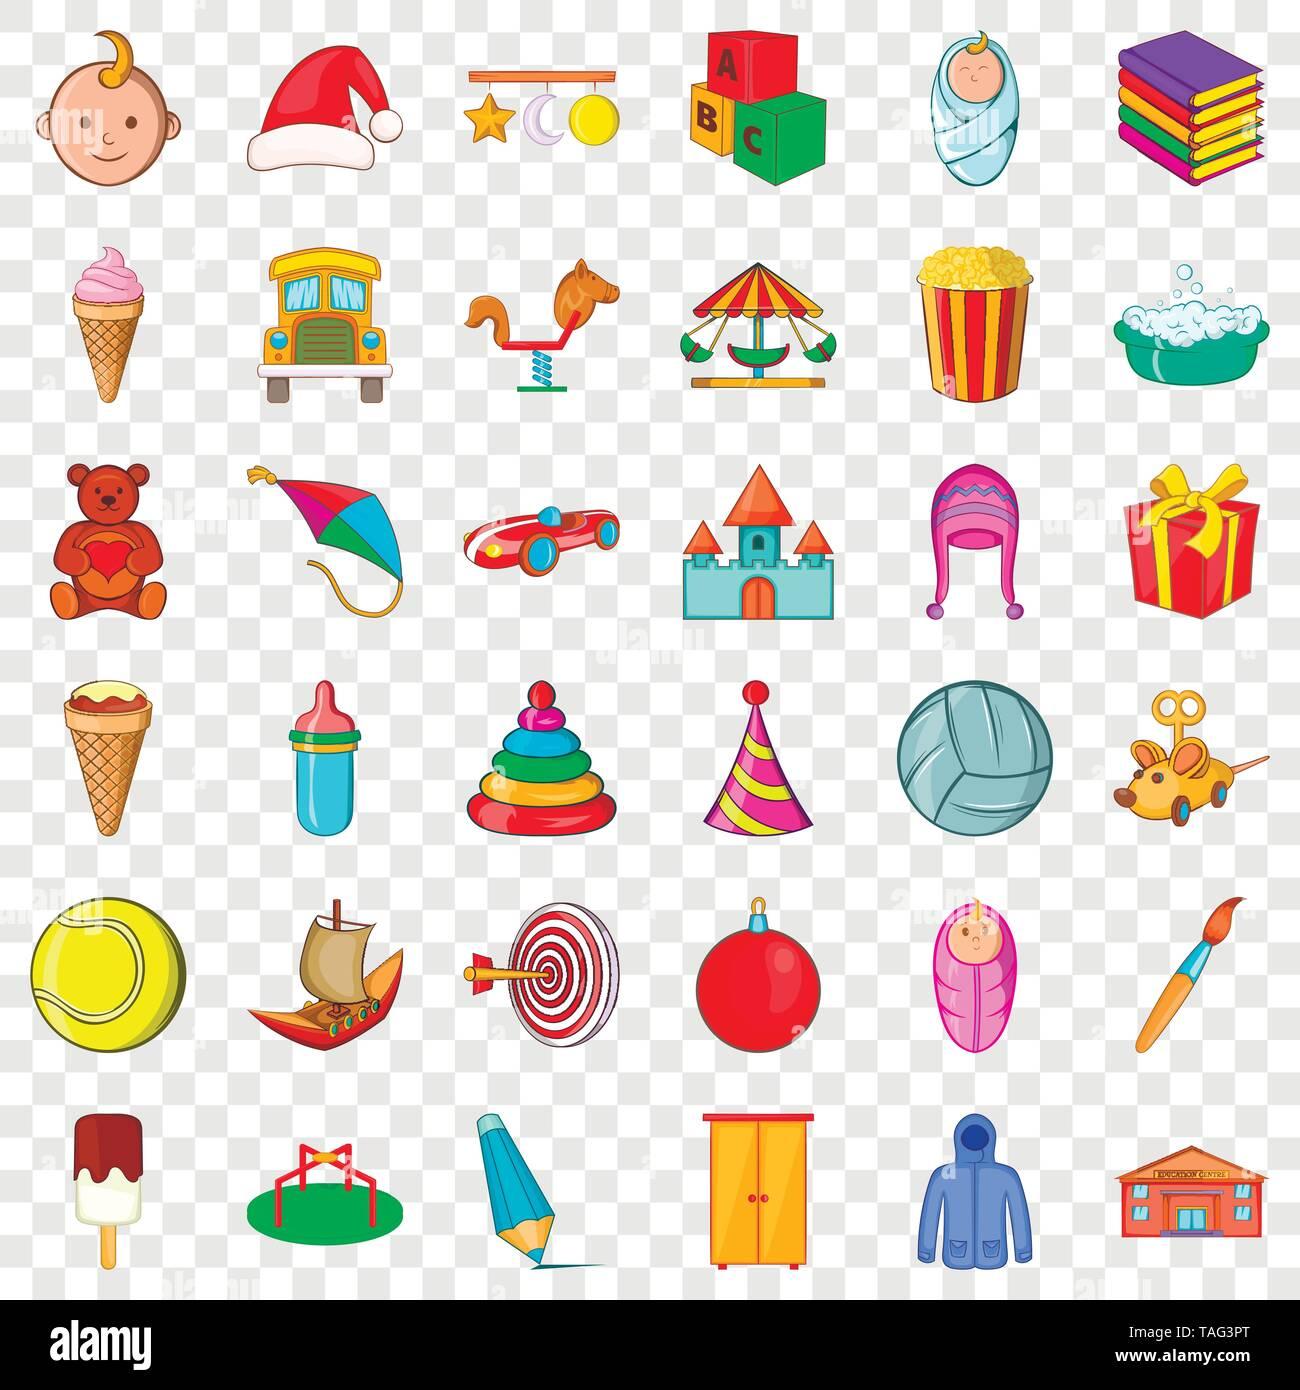 Carousel icons set, cartoon style - Stock Image